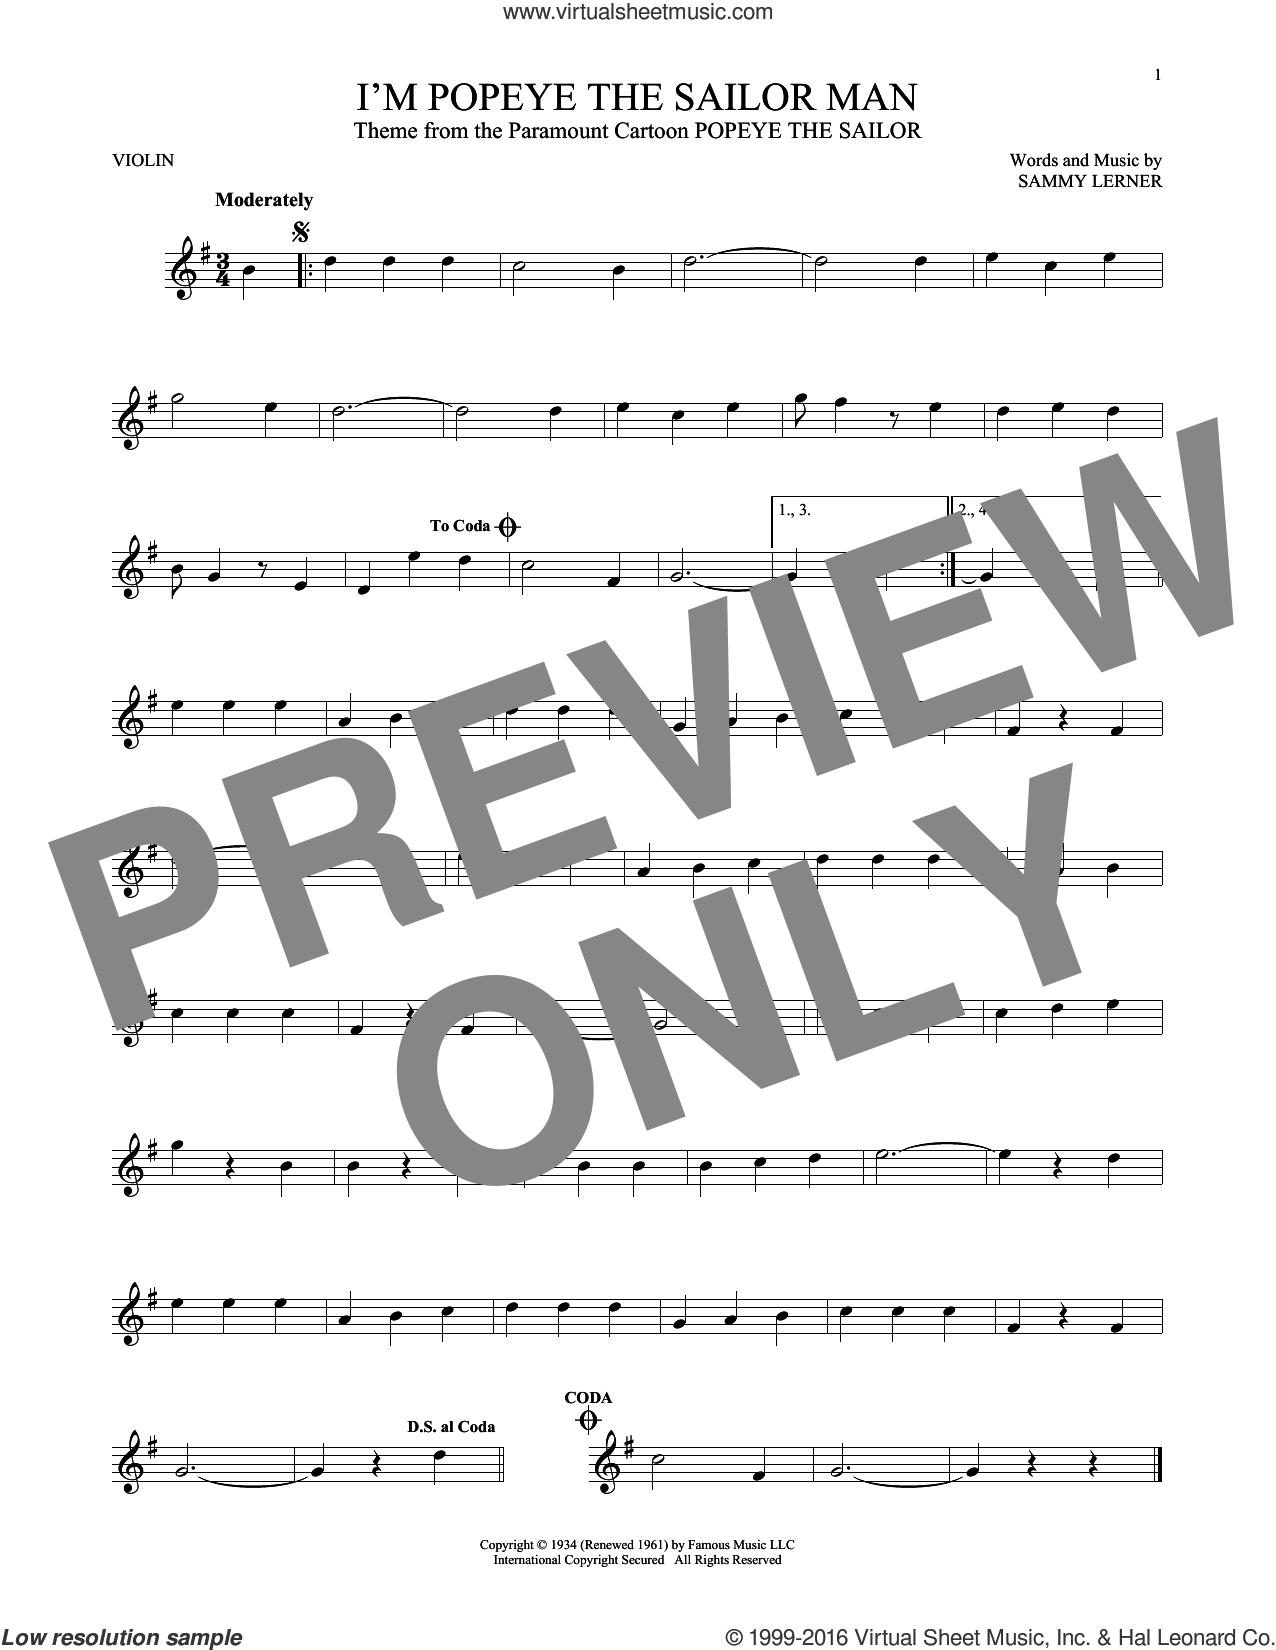 I'm Popeye The Sailor Man sheet music for violin solo by Sammy Lerner, intermediate skill level